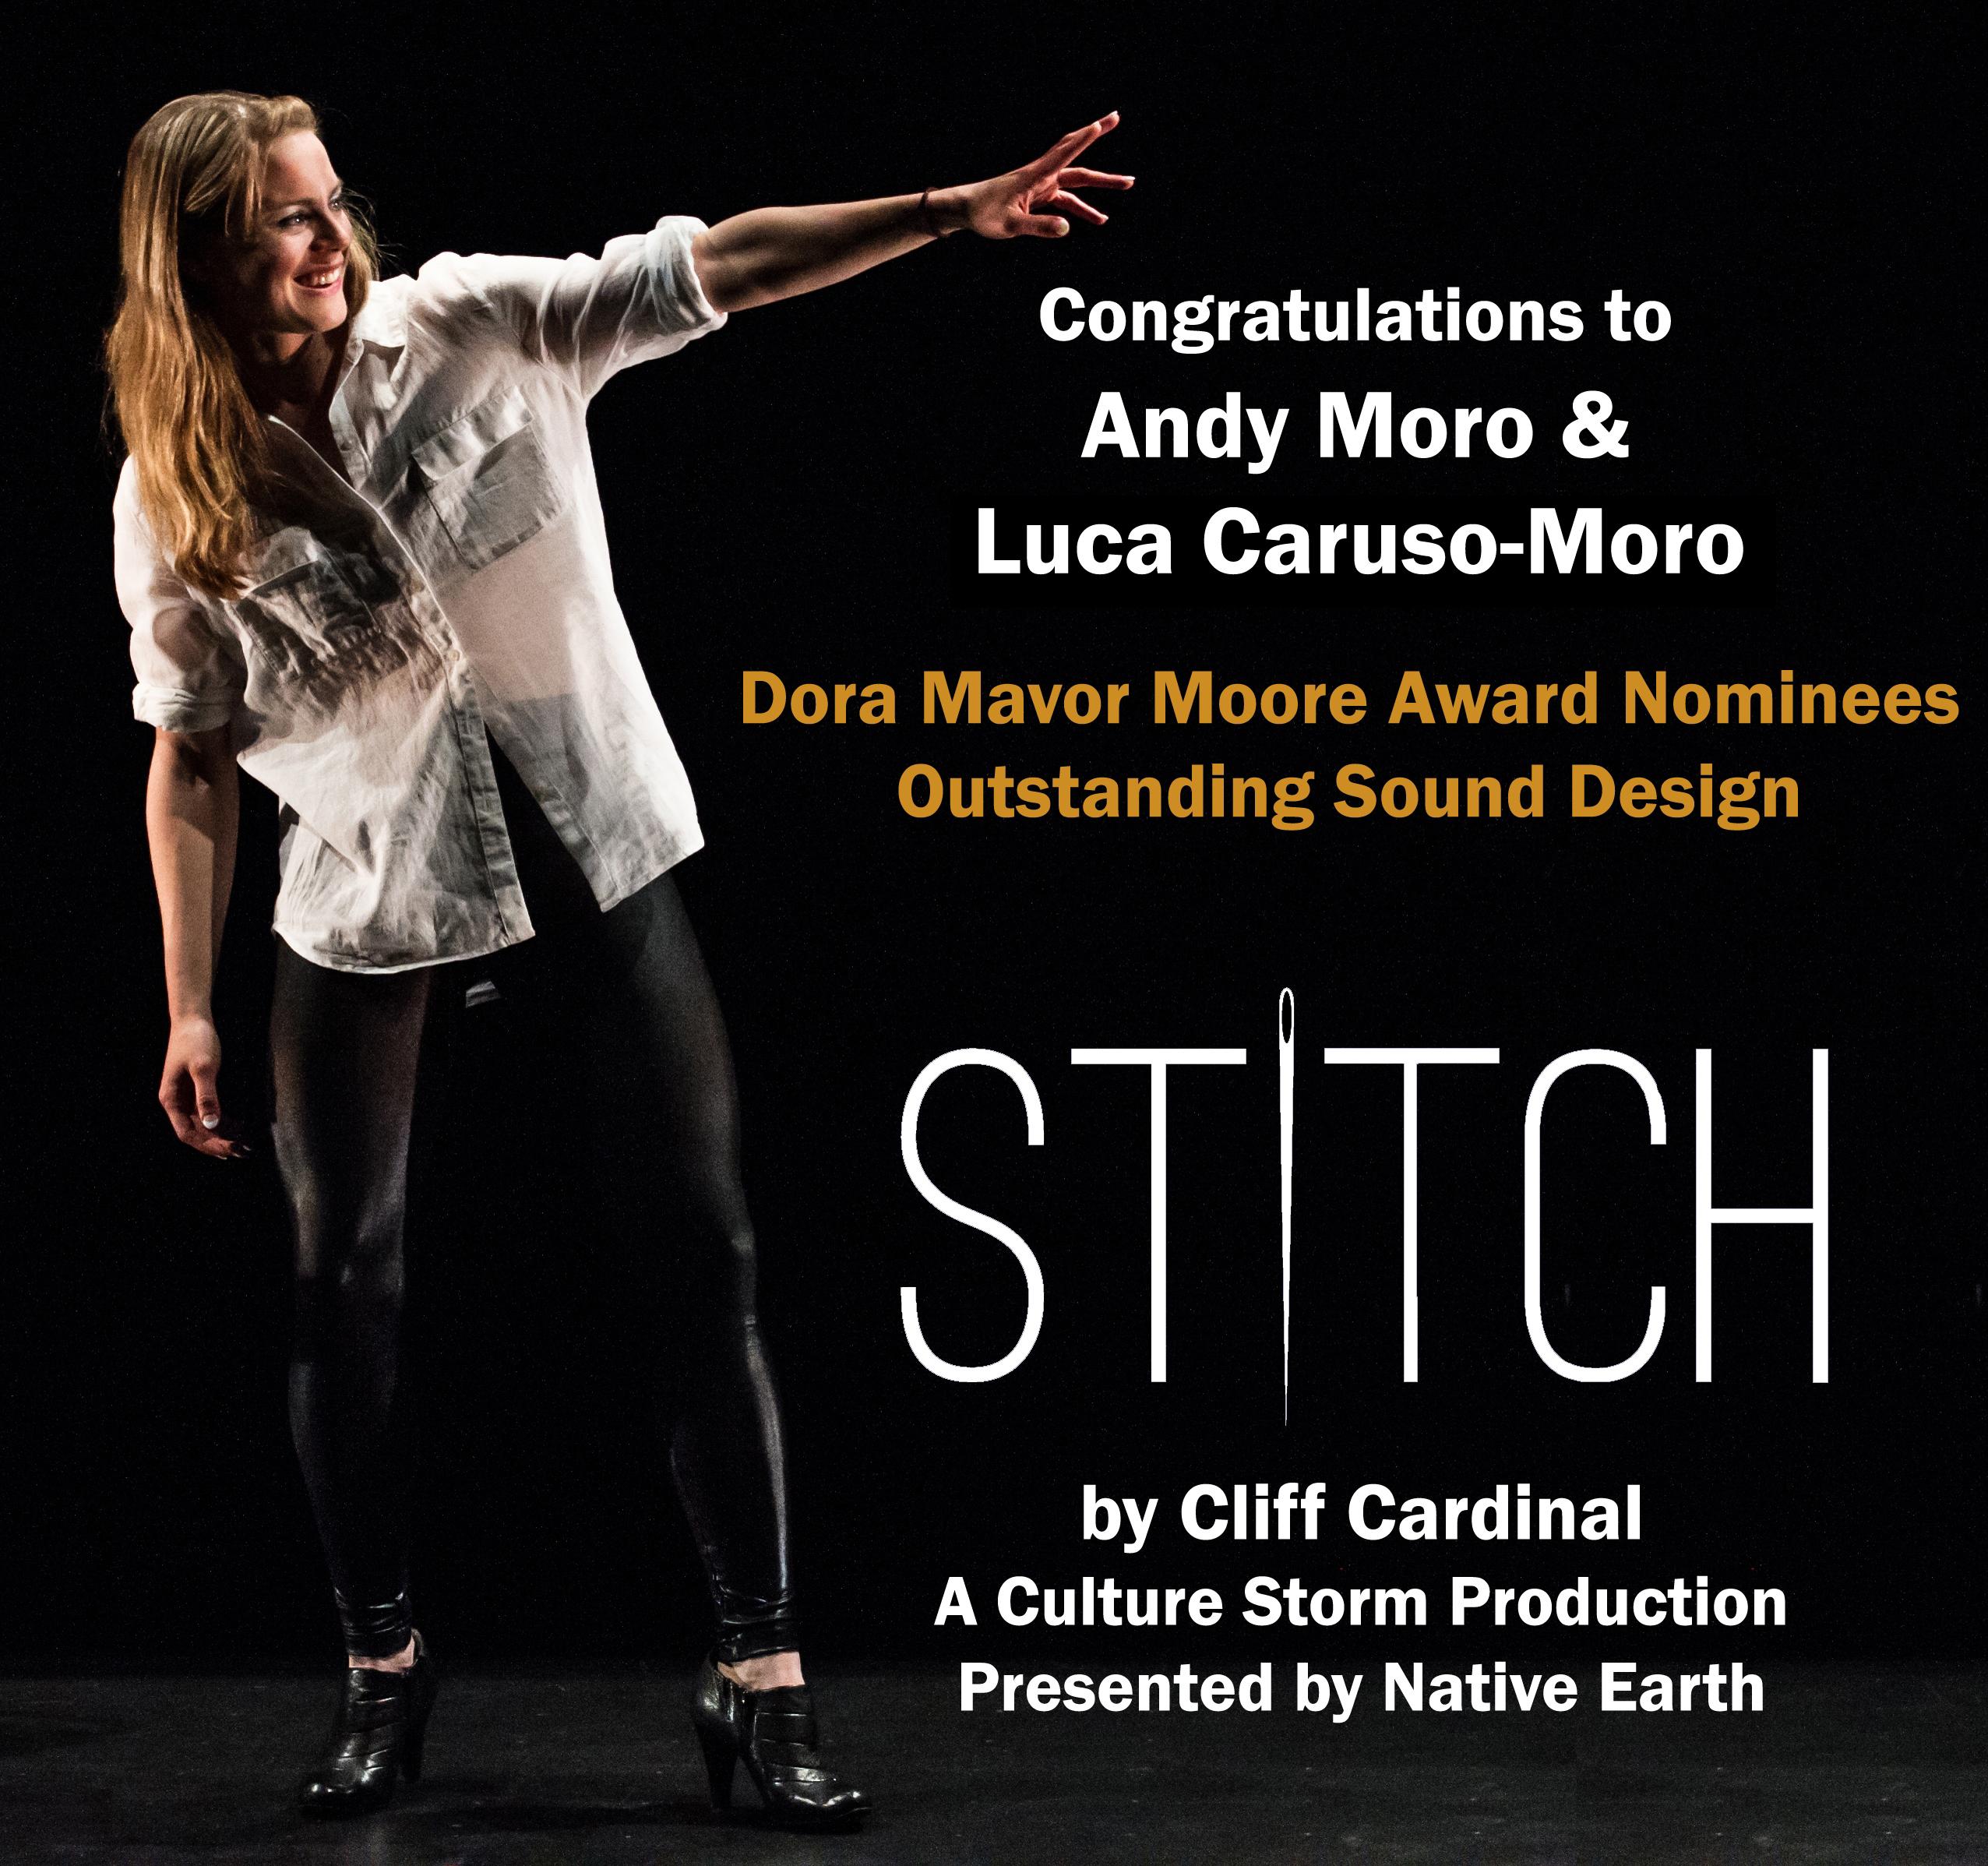 Stitch Nomination Announcement